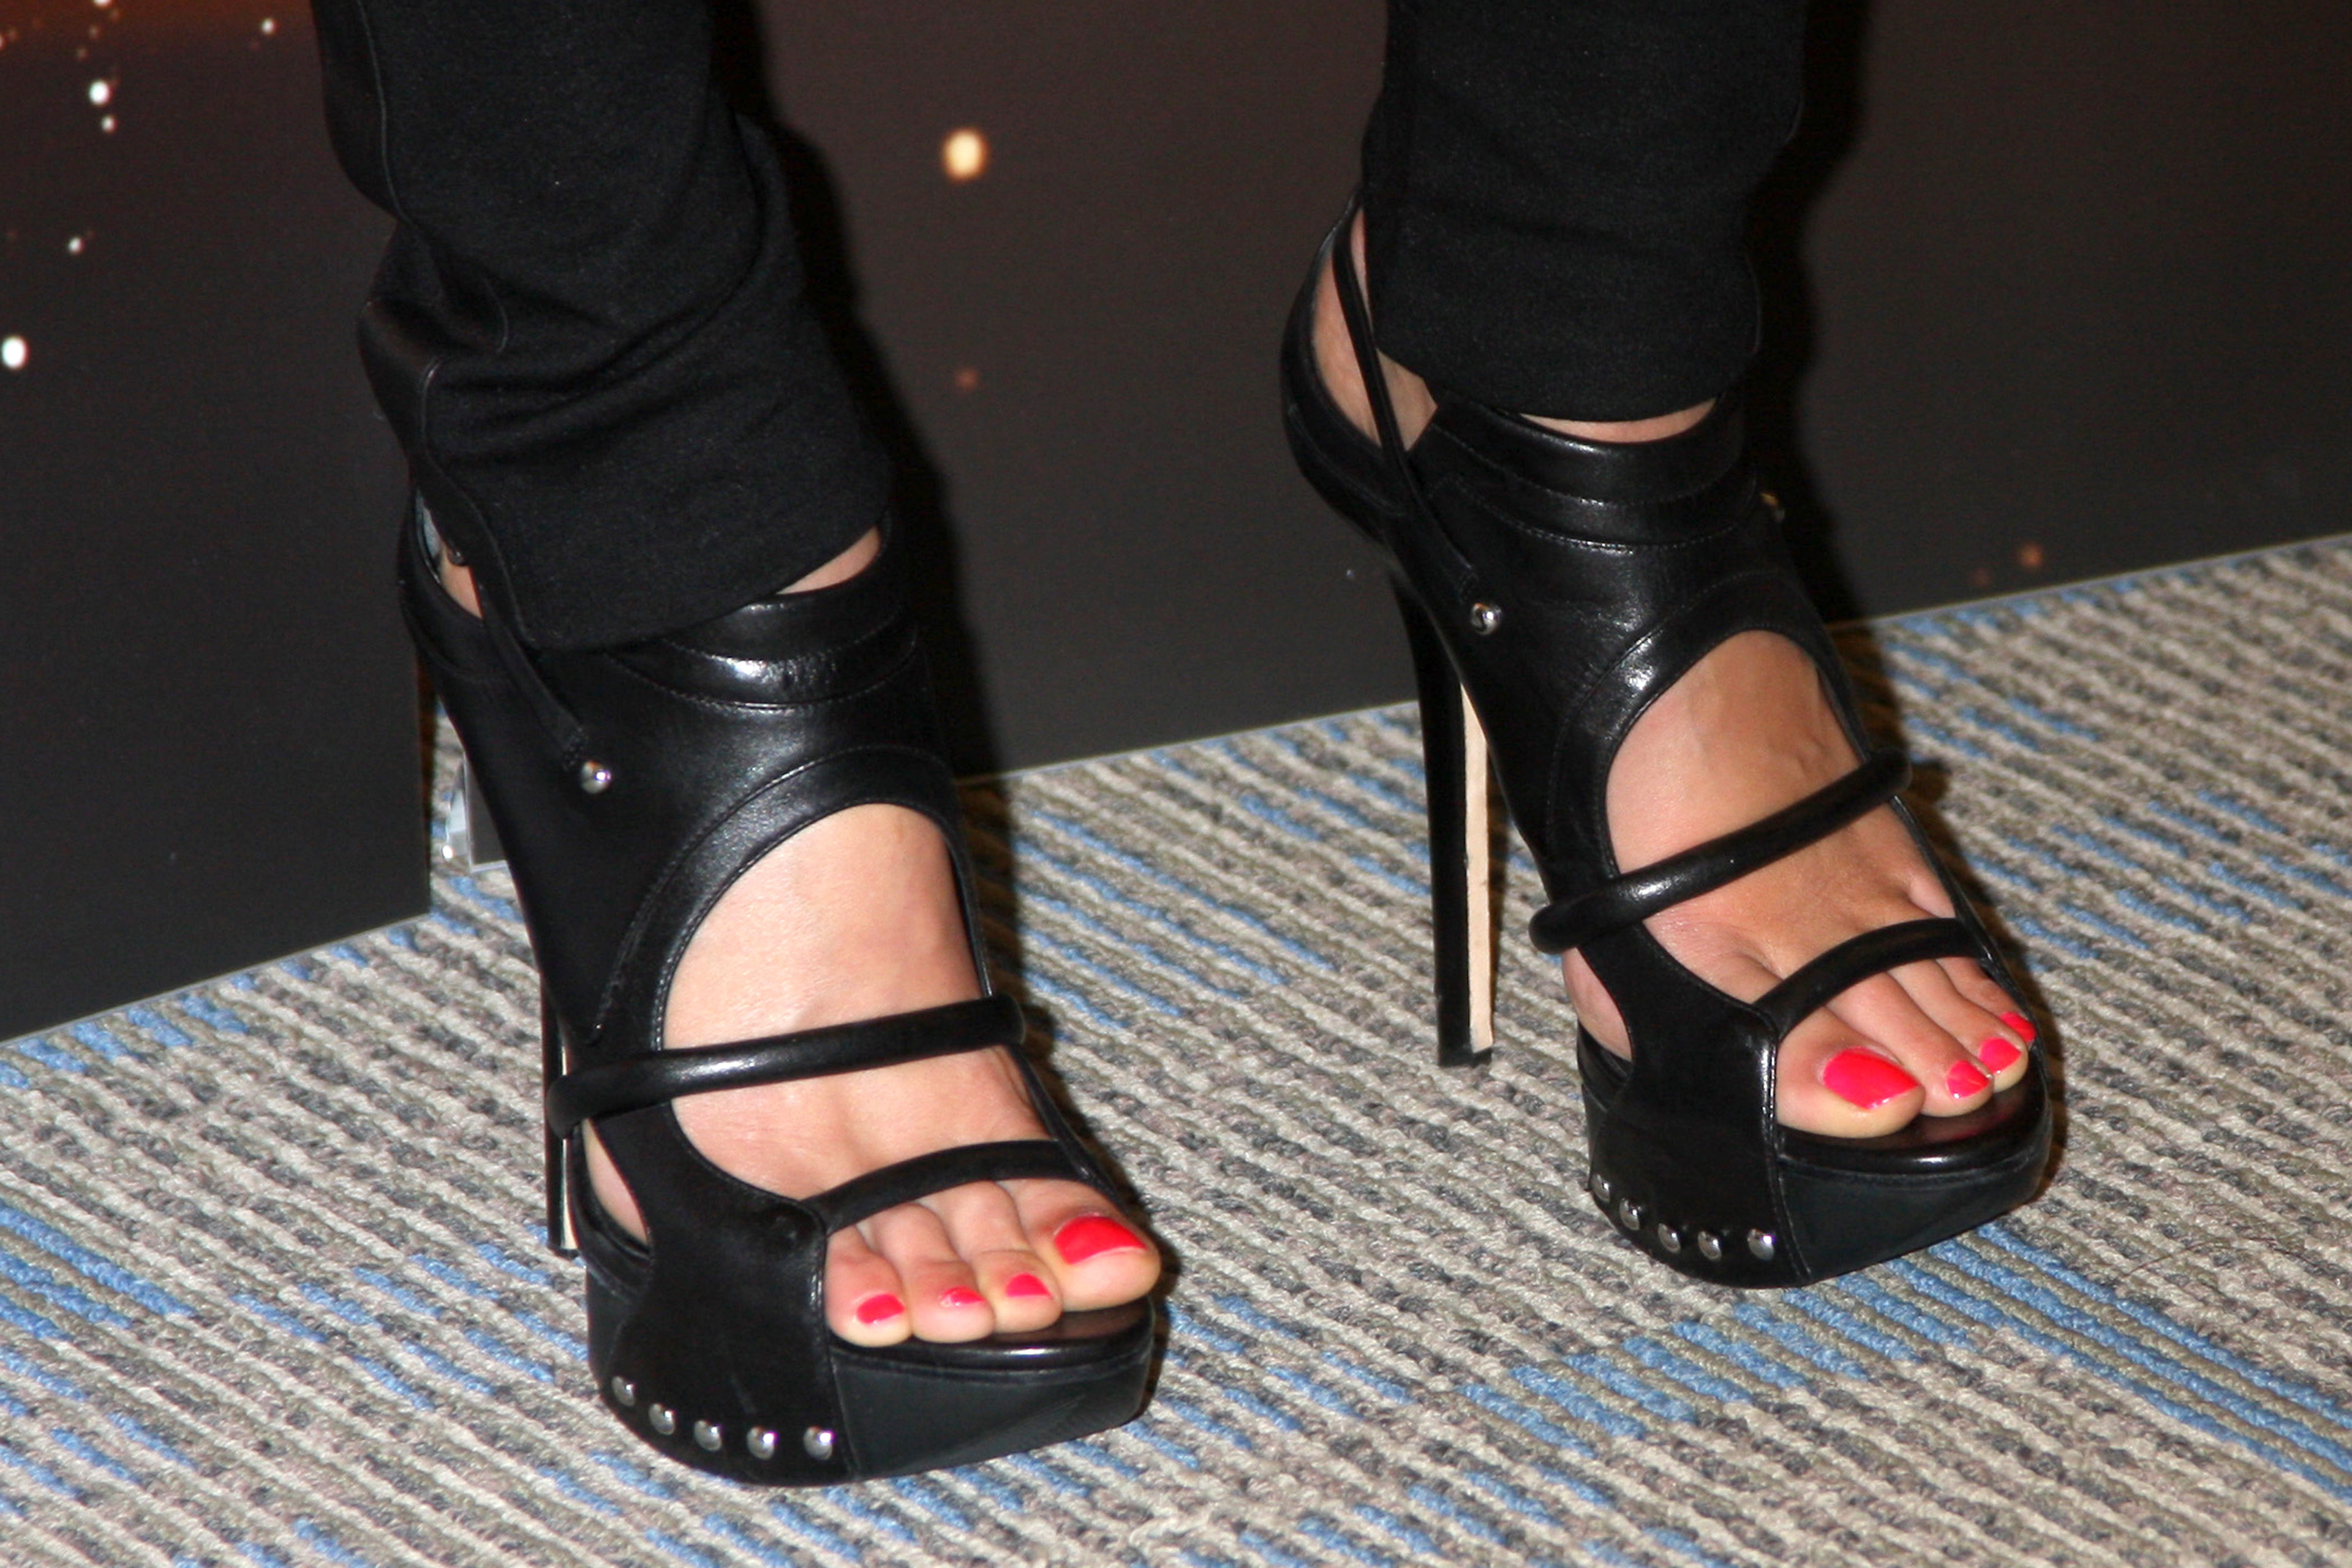 Missy Peregryms Feet